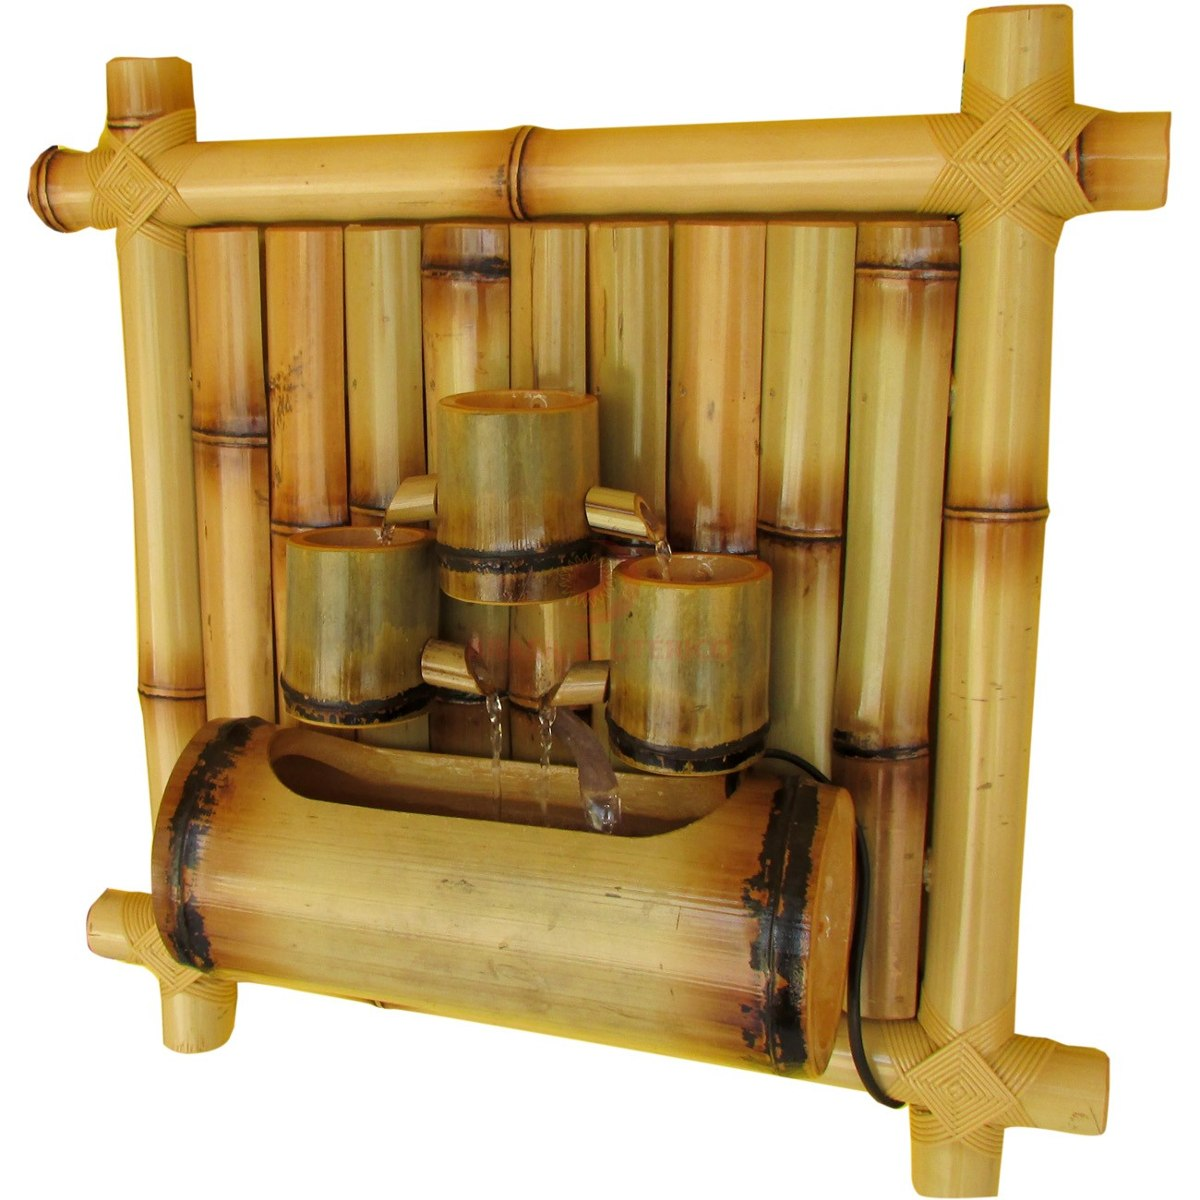 Fonte De Água Bambu De Parede 45cm 110 Volts R$ 133 00 no  #714417 1200 1200